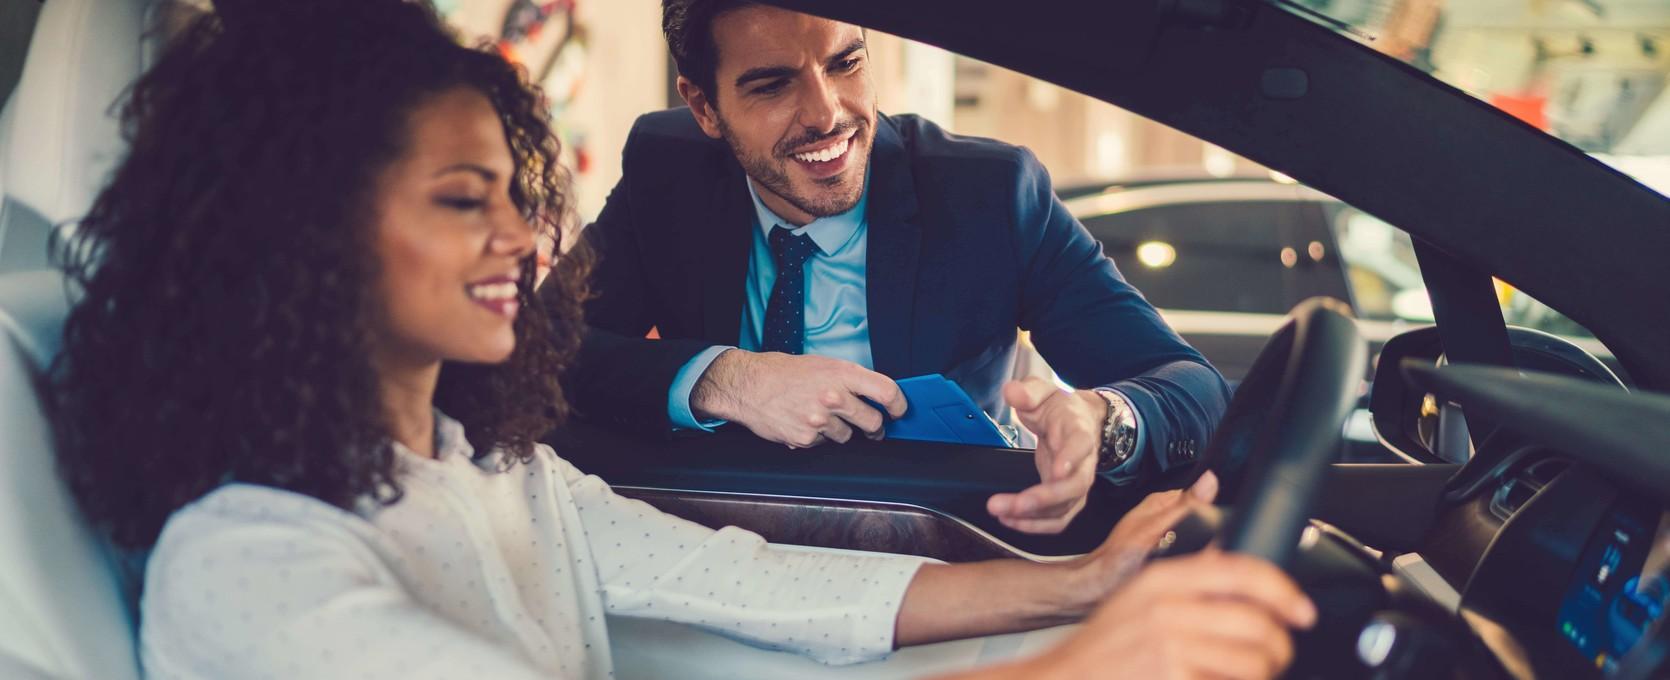 Happy customer at an automotive dealership